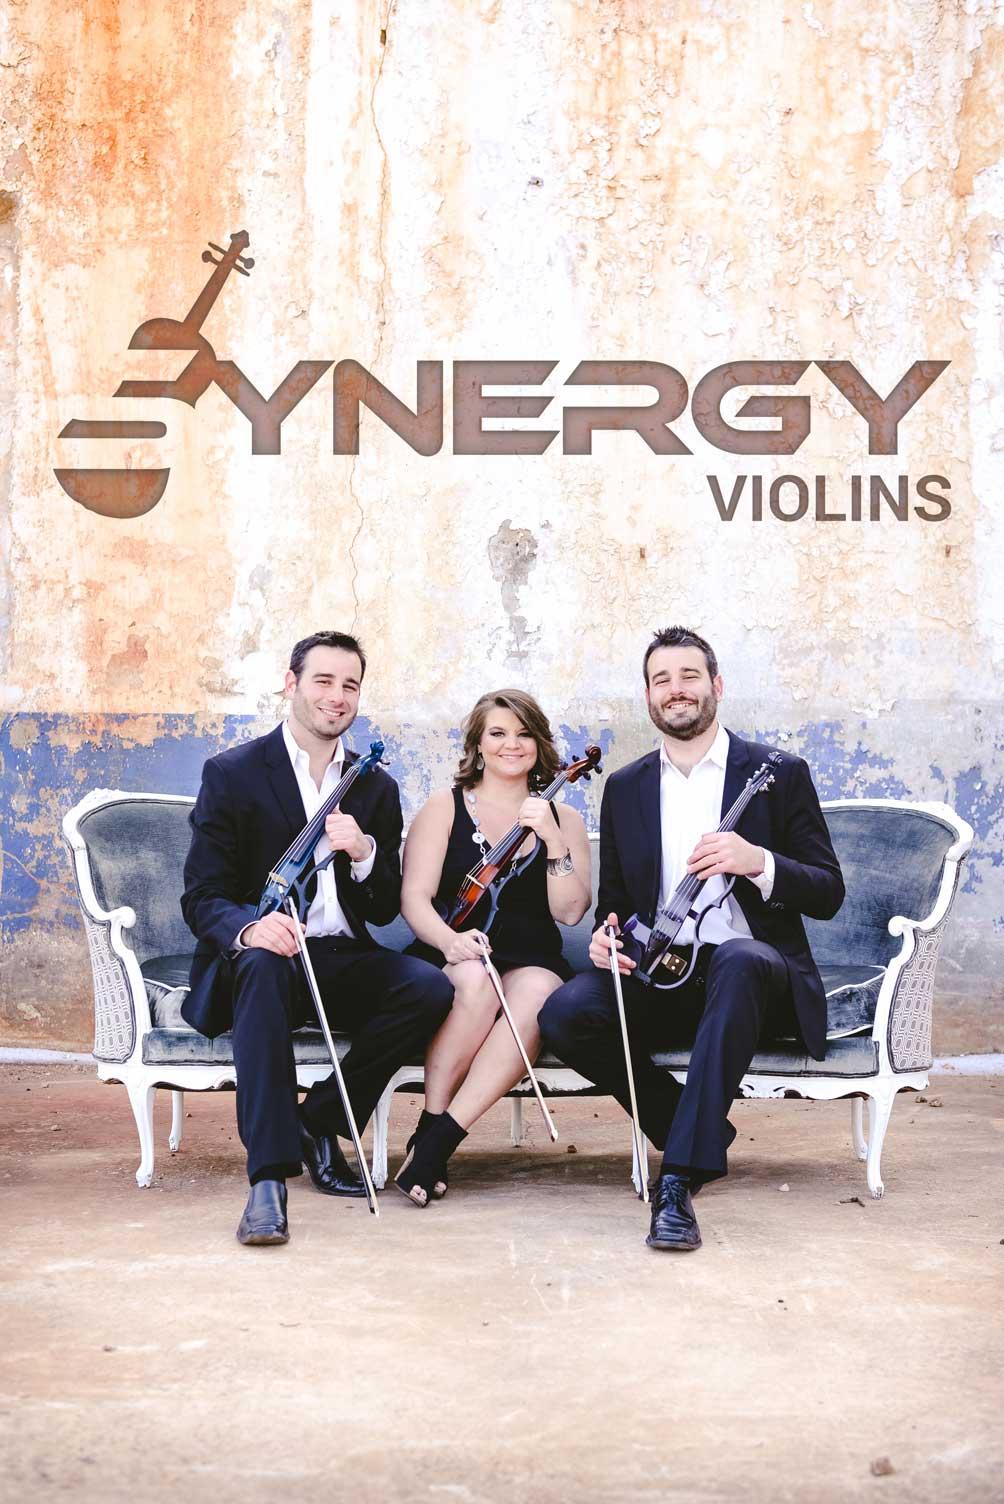 Synergy Violins